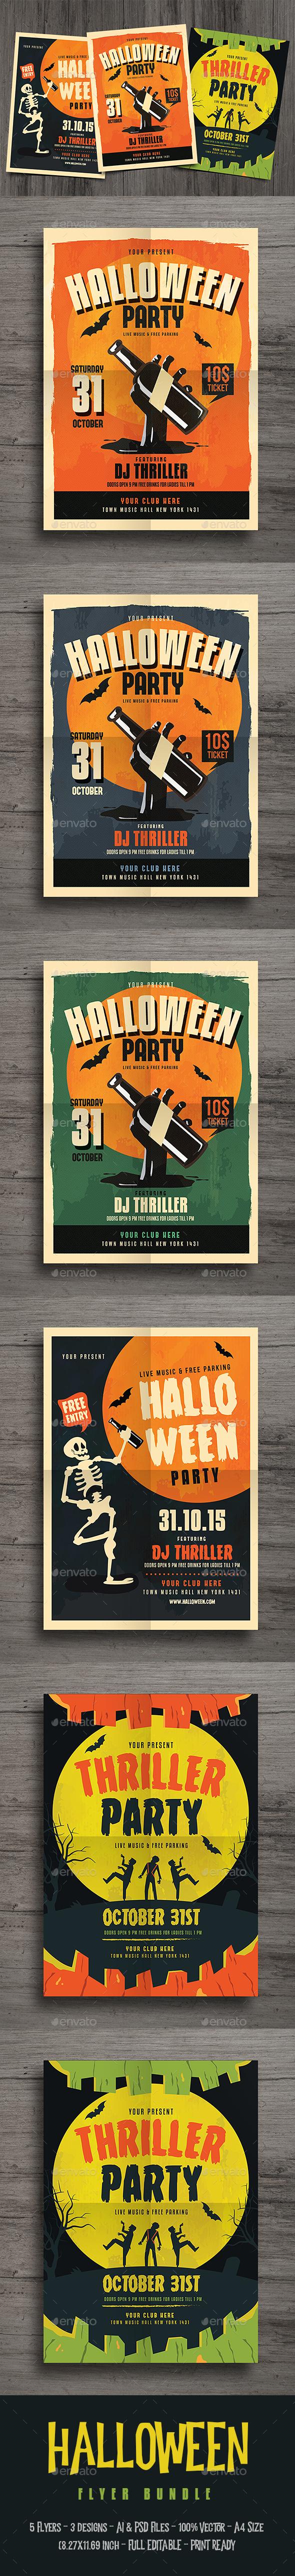 Old Halloween Event Flyer Bundle